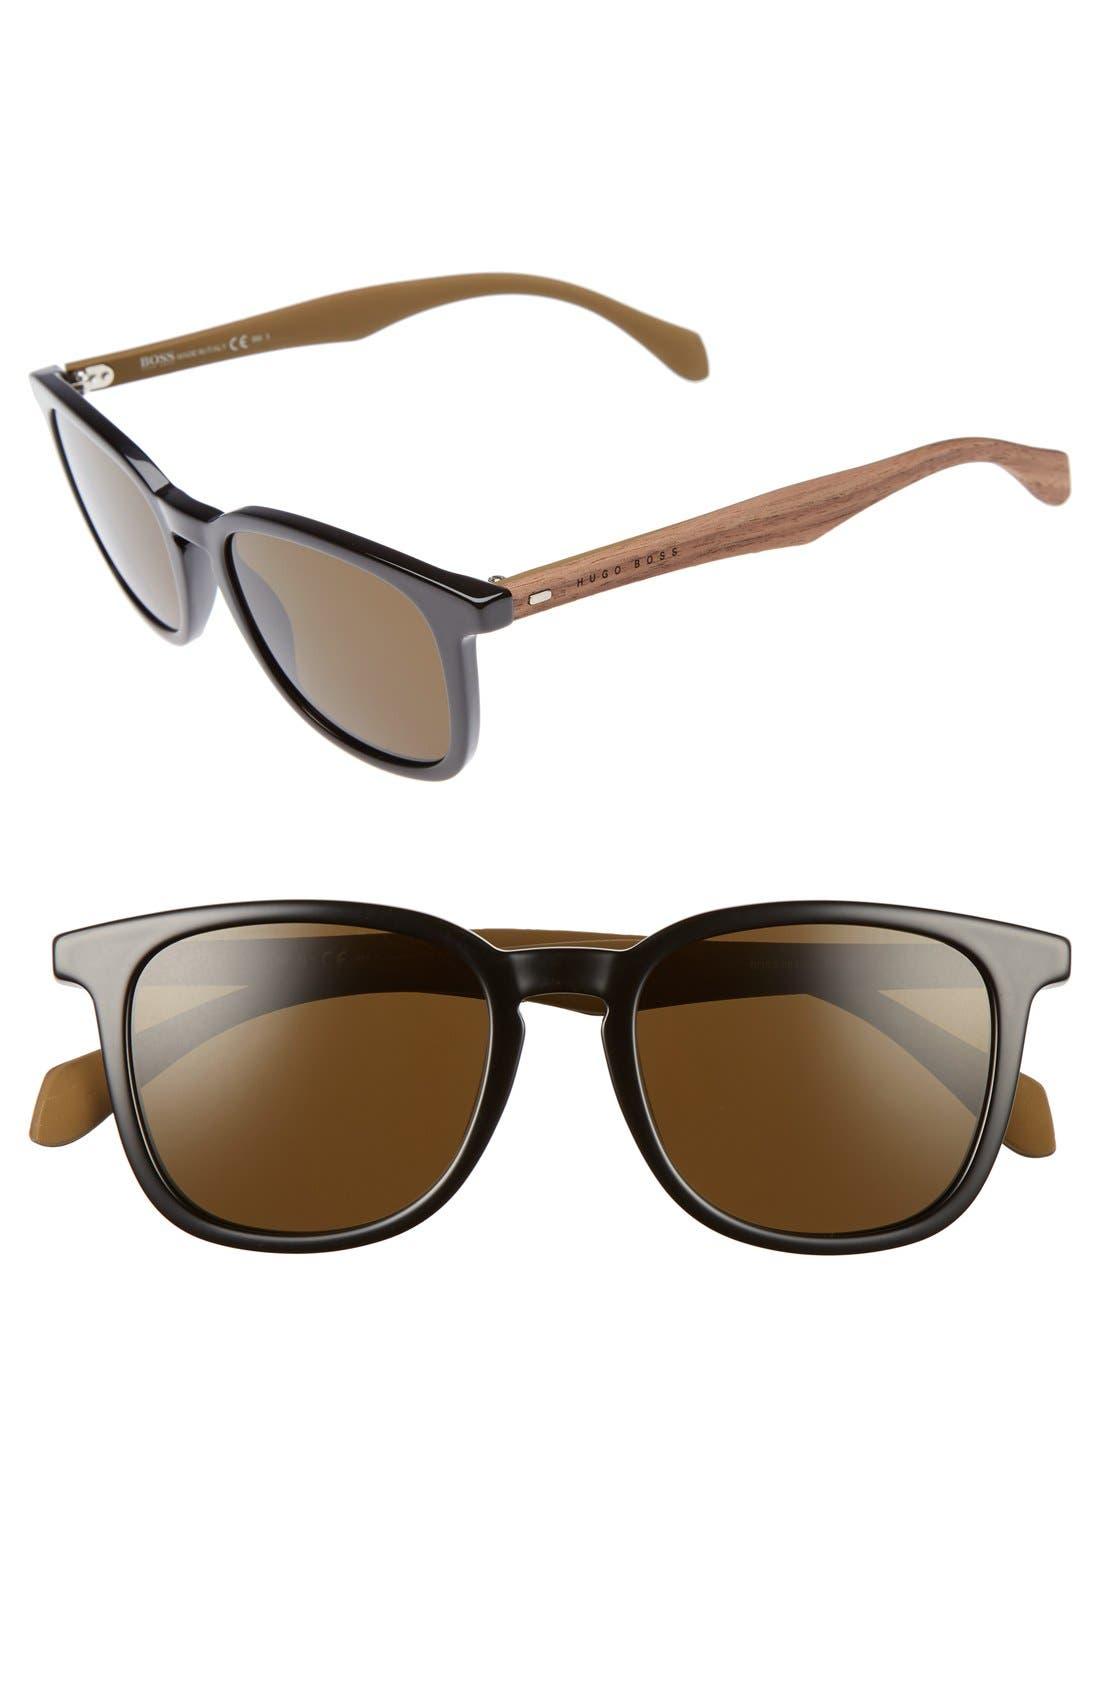 843/S 52mm Sunglasses,                         Main,                         color,